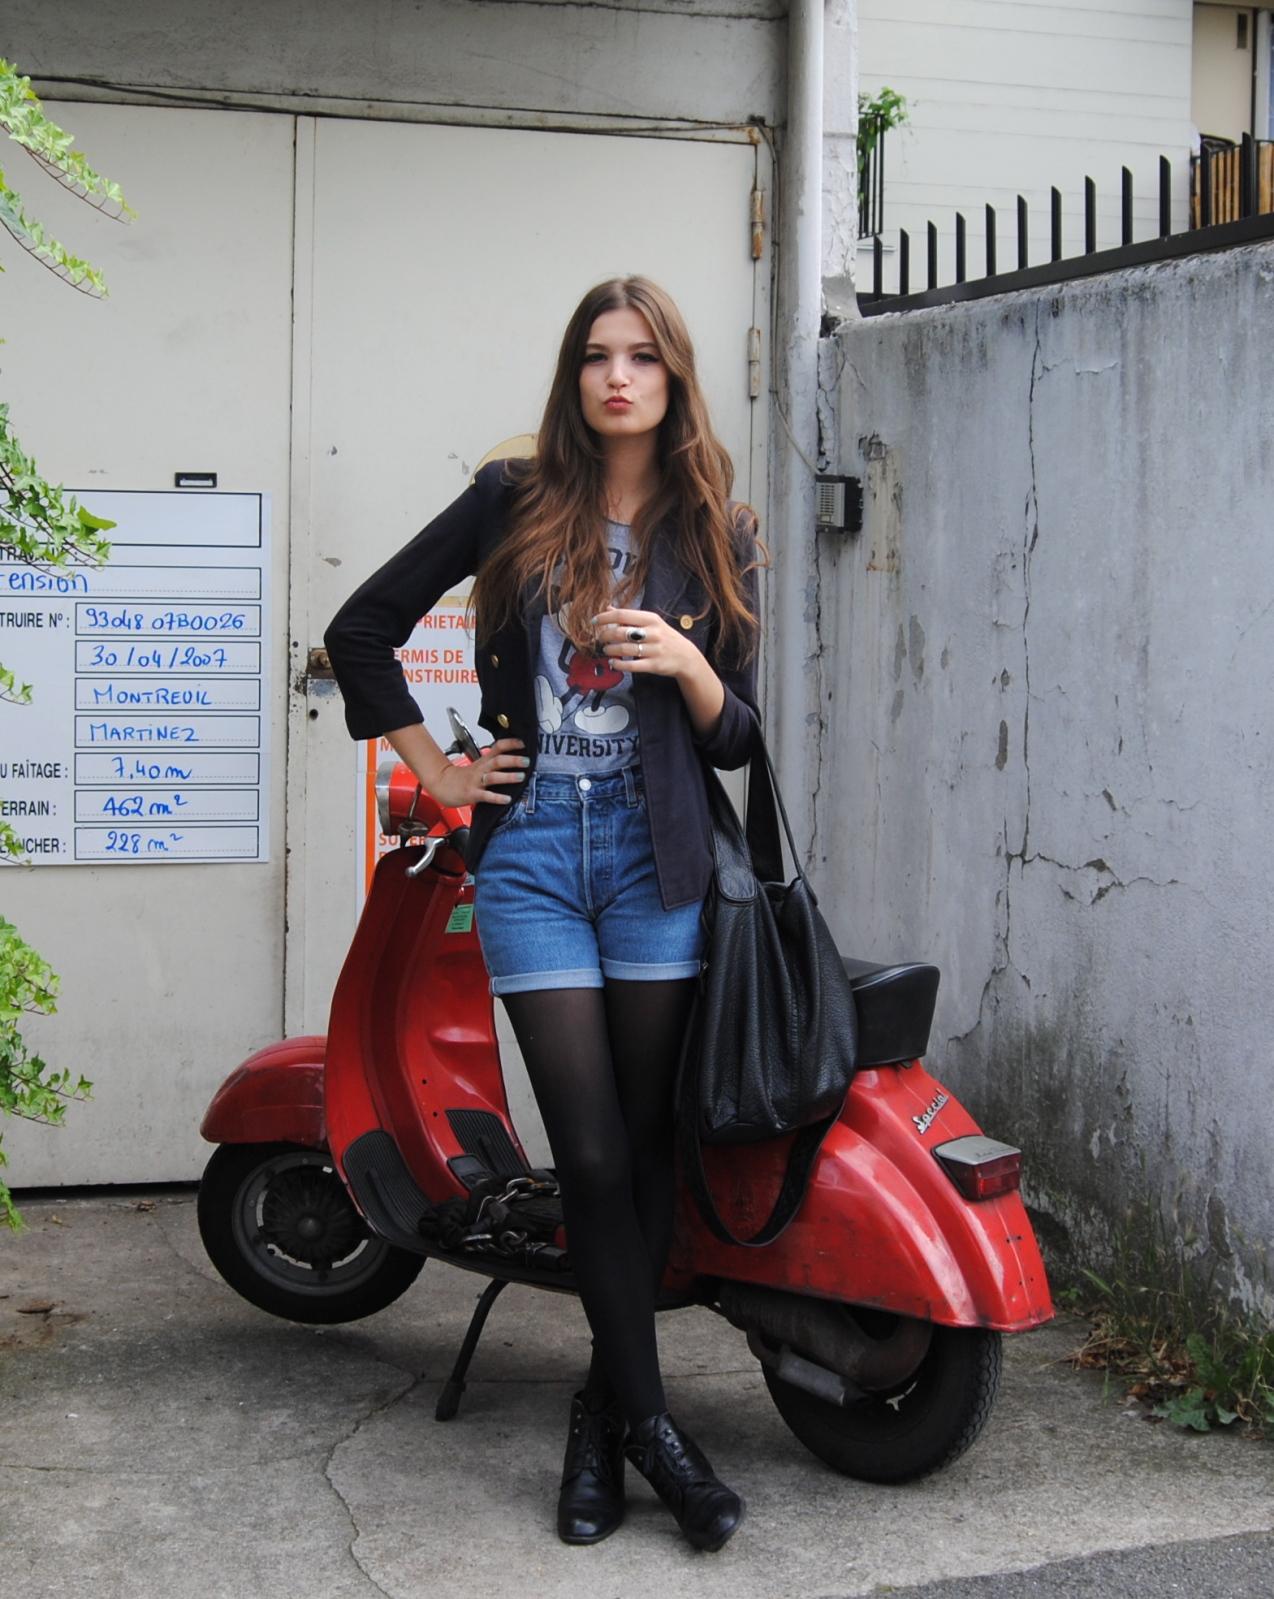 Sara Jean Underwood Bike Cool show me a bike: show me a vespa!